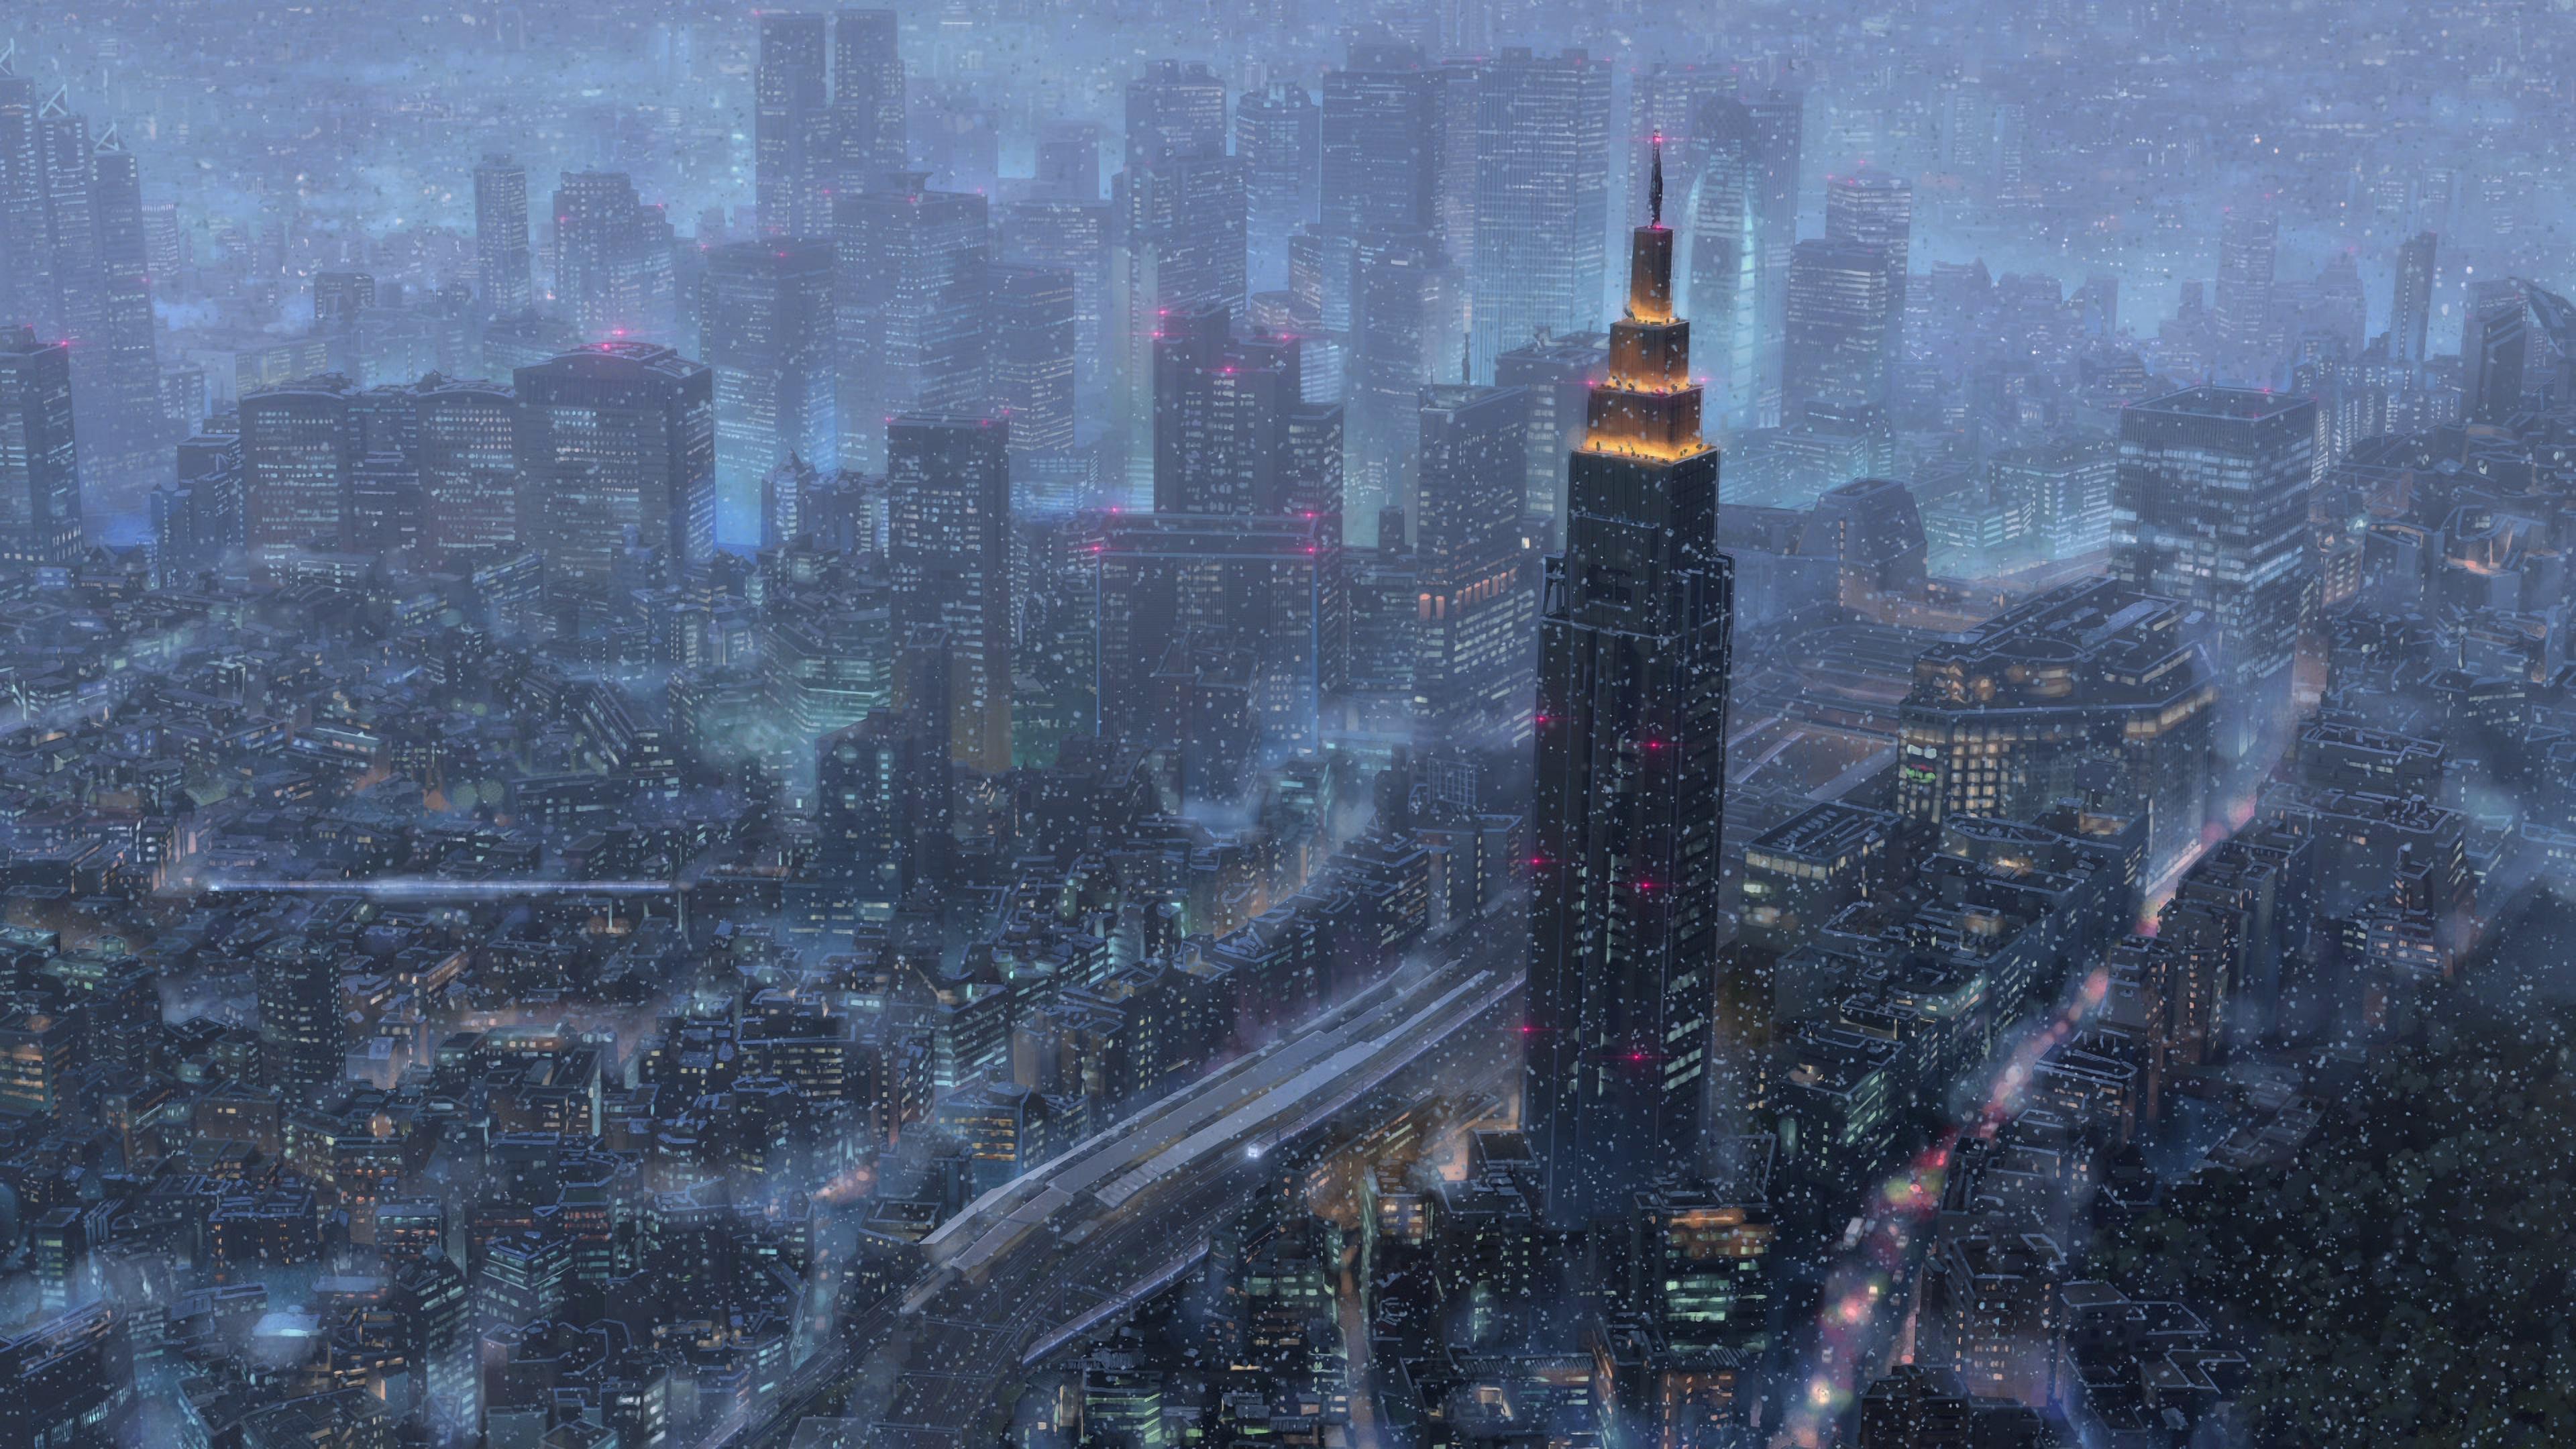 Anime 3840x2160 rain night city city lights